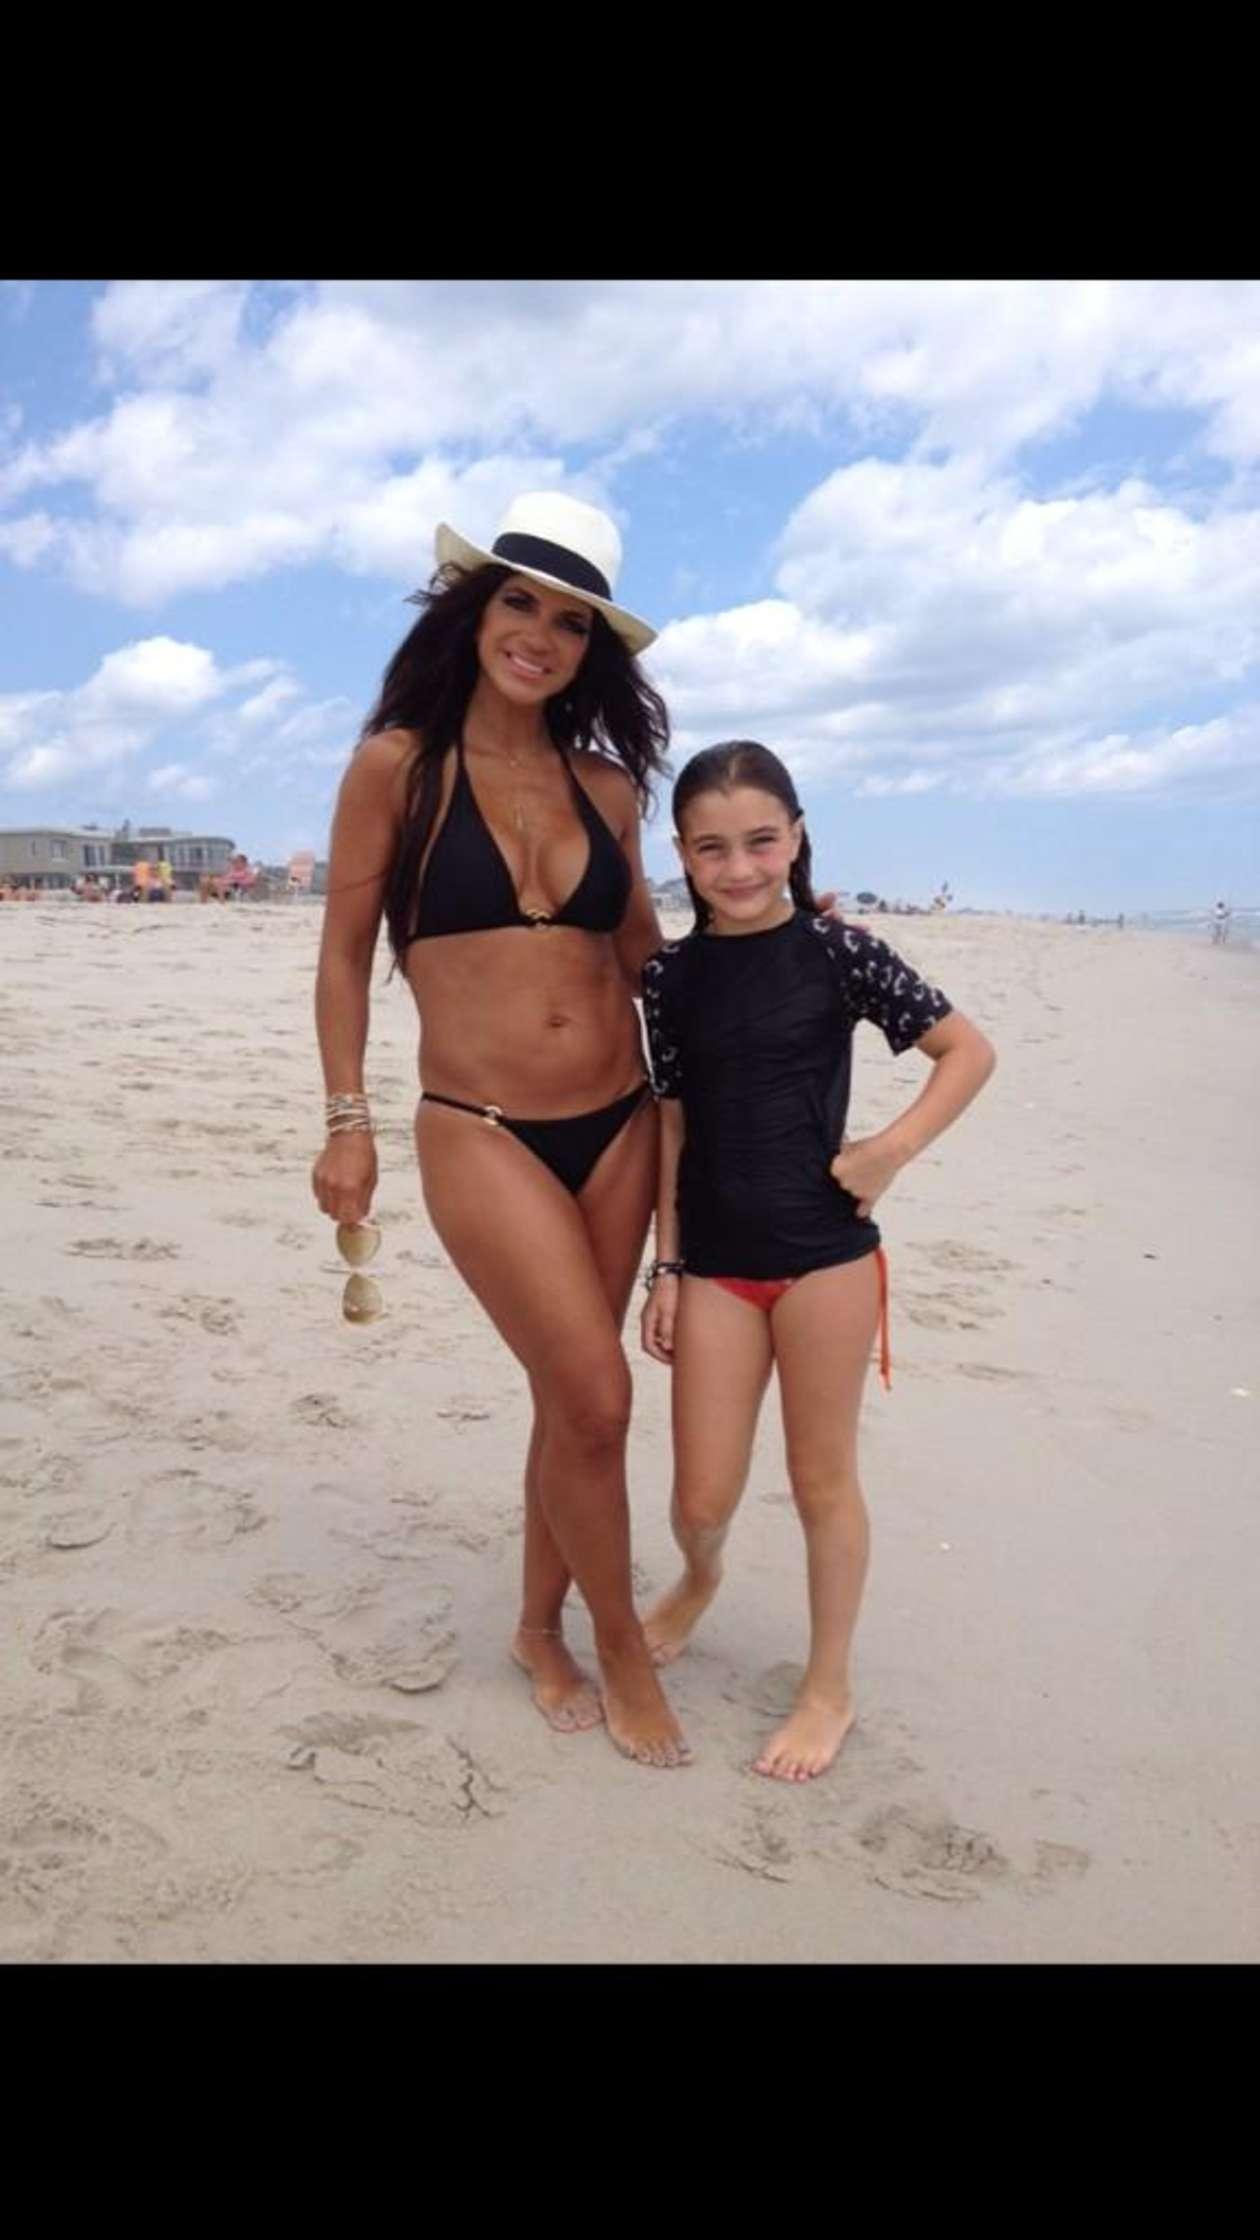 Teresa Giudice Shows Off Bikini Body on Family Beach Trip (PHOTOS)